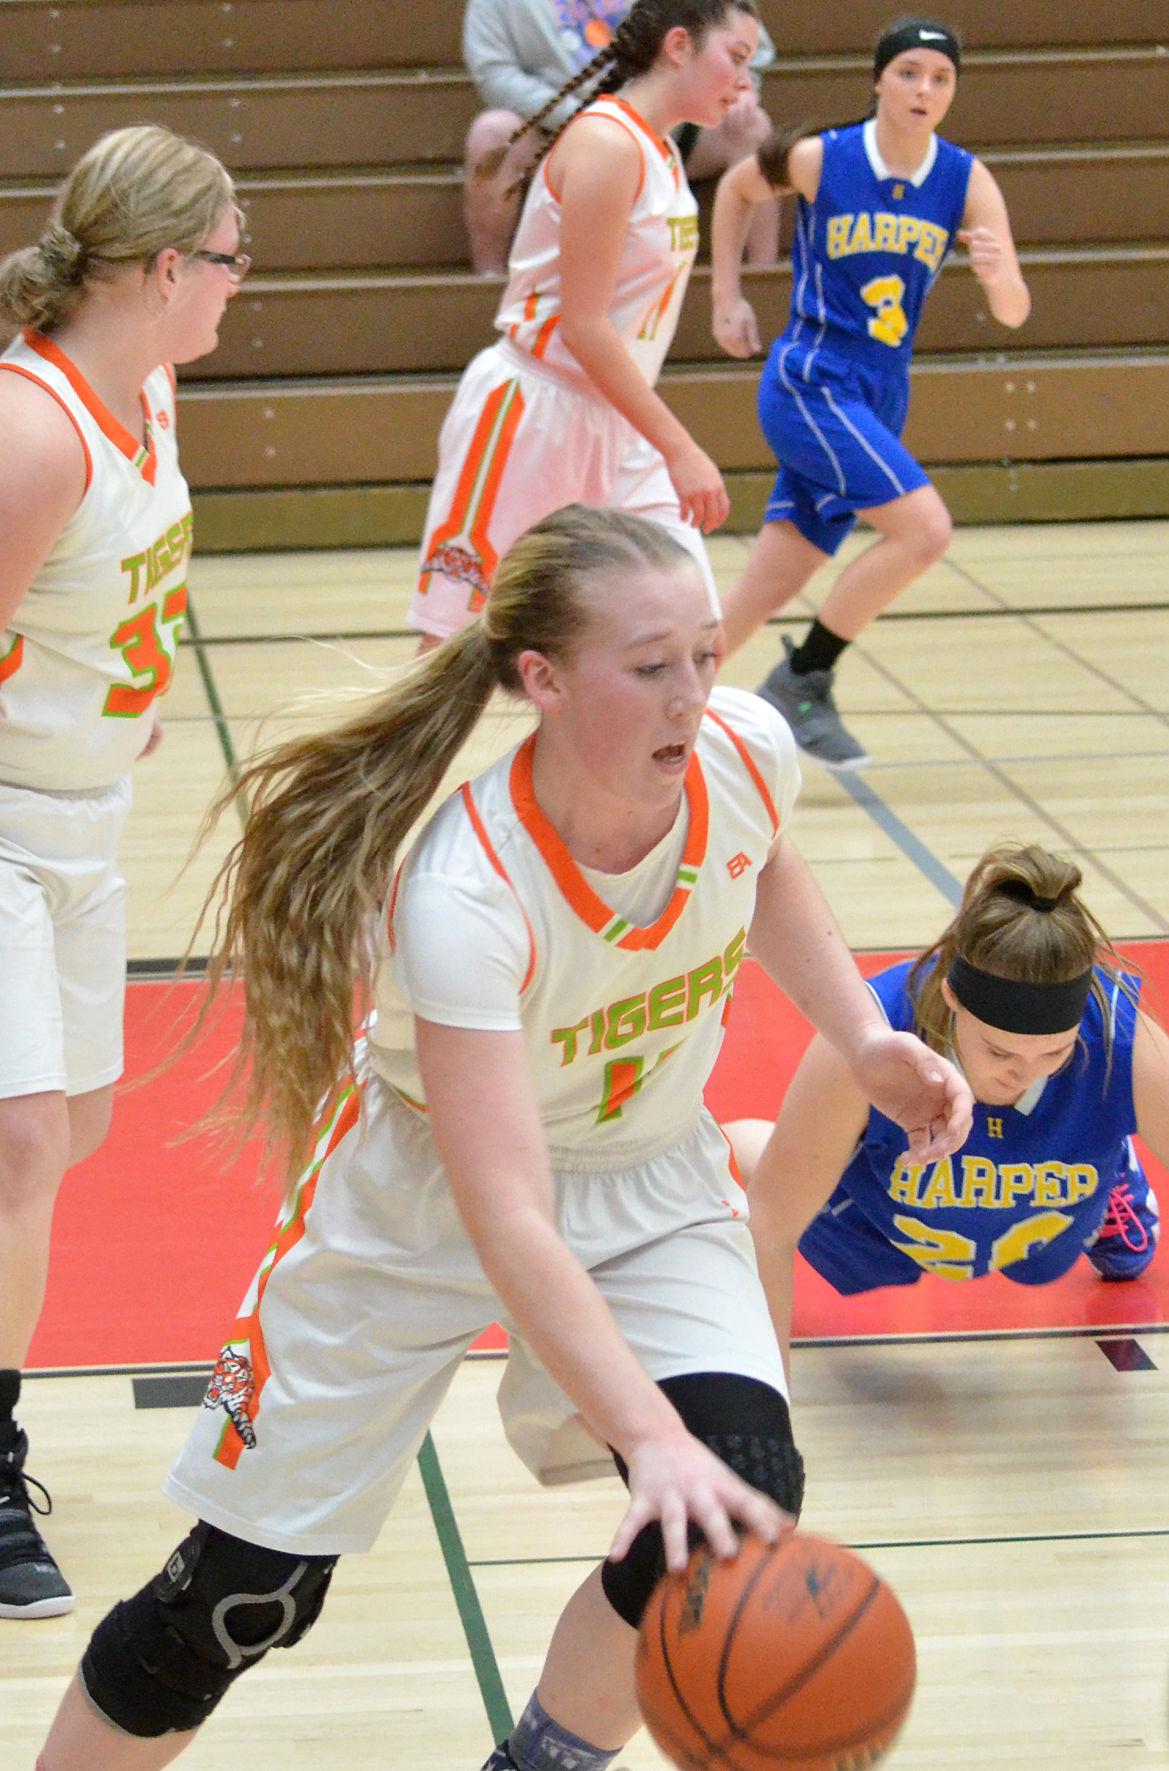 Dayville/Monument girls basketball